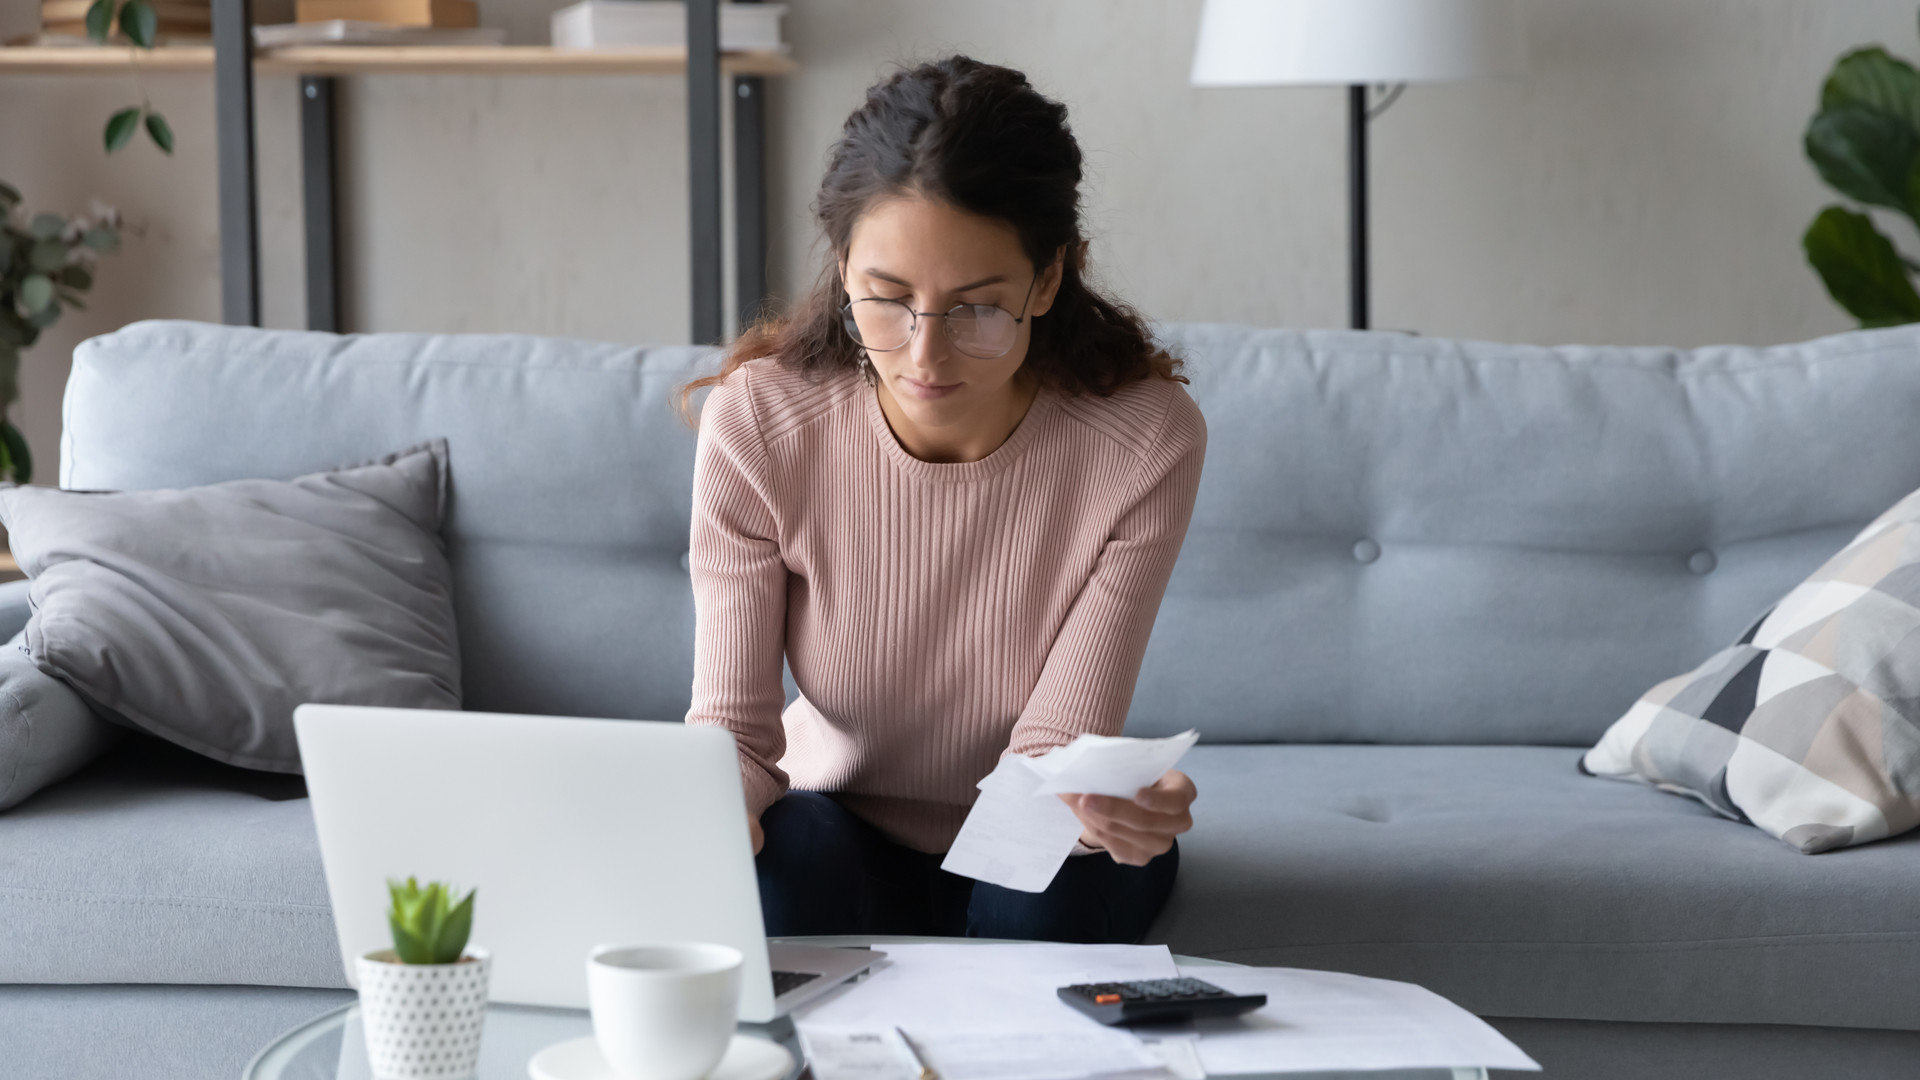 Serious female manage family finances using laptop